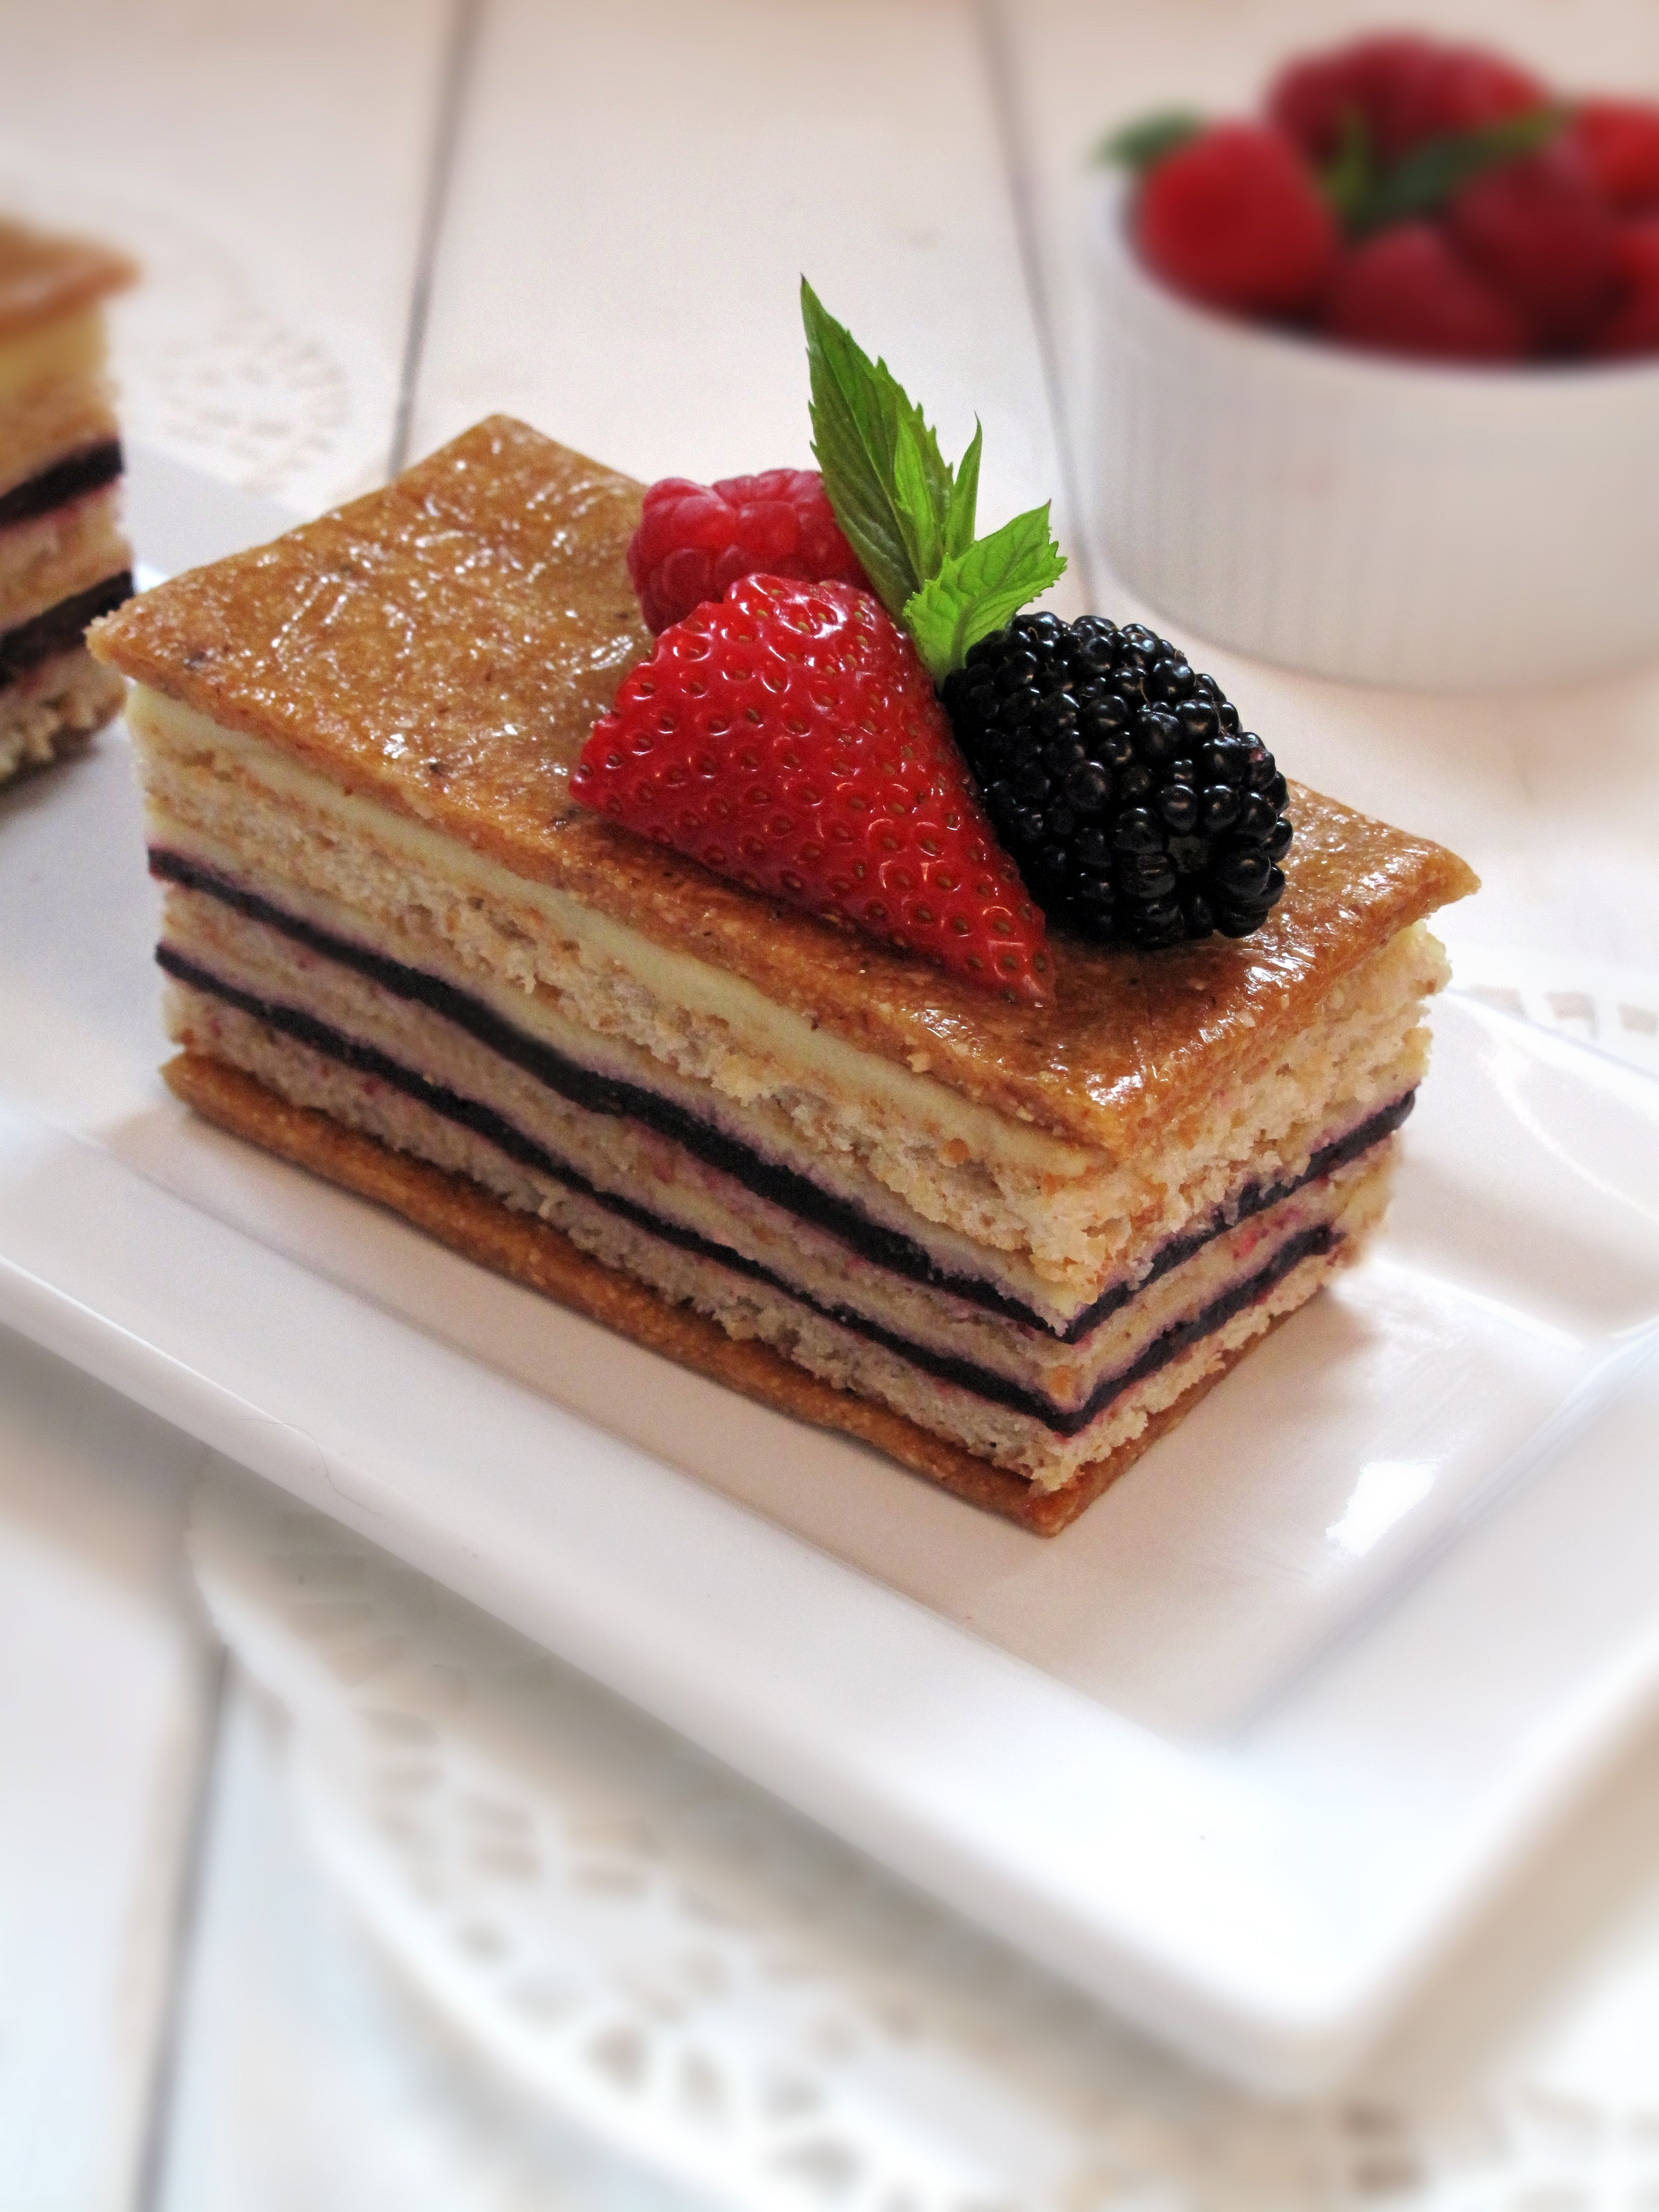 Raspberry hazelnut torte with vanilla-chive pastry cream, hazelnut dacquoise, and hazelnut nougatine #food #foodporn #cake